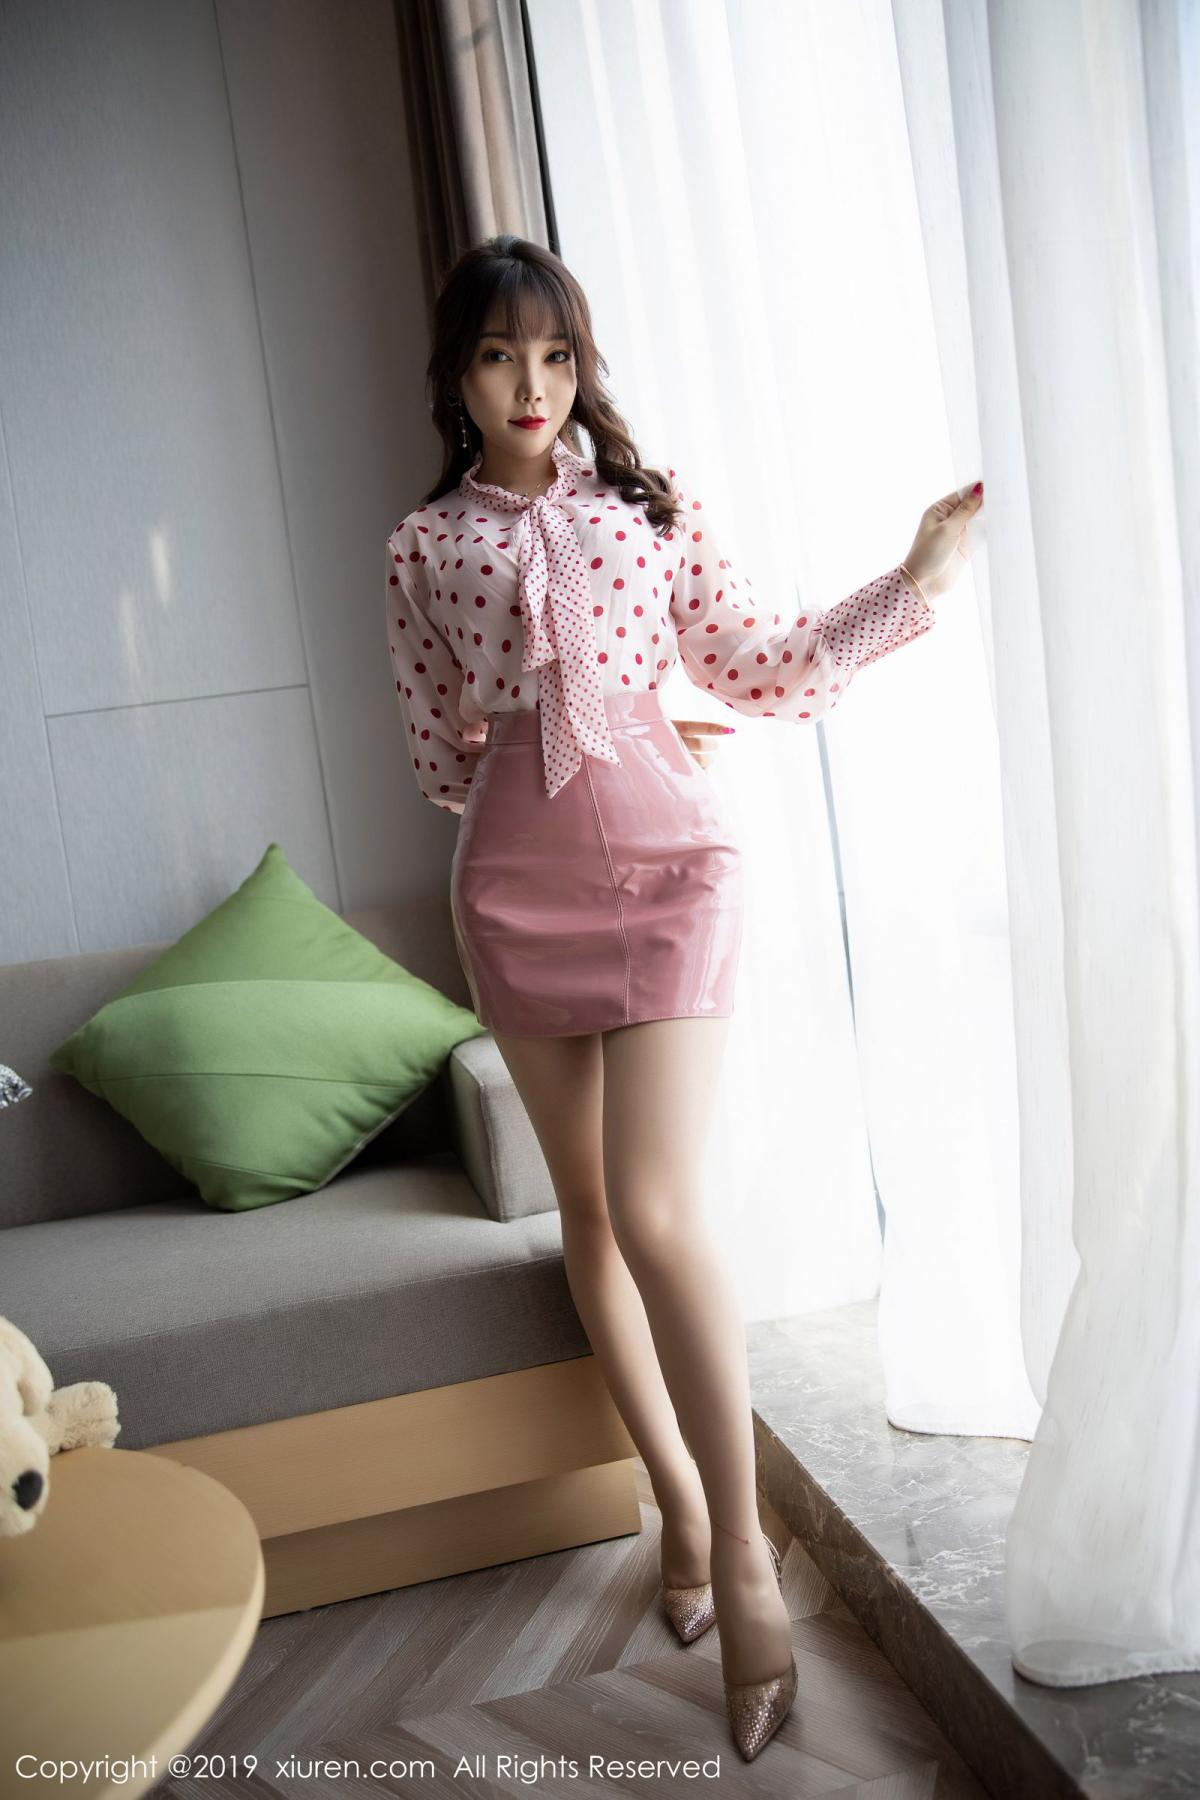 [XiuRen] Vol.1742 Chen Zhi 3P, Chen Zhi, Tall, Underwear, Xiuren